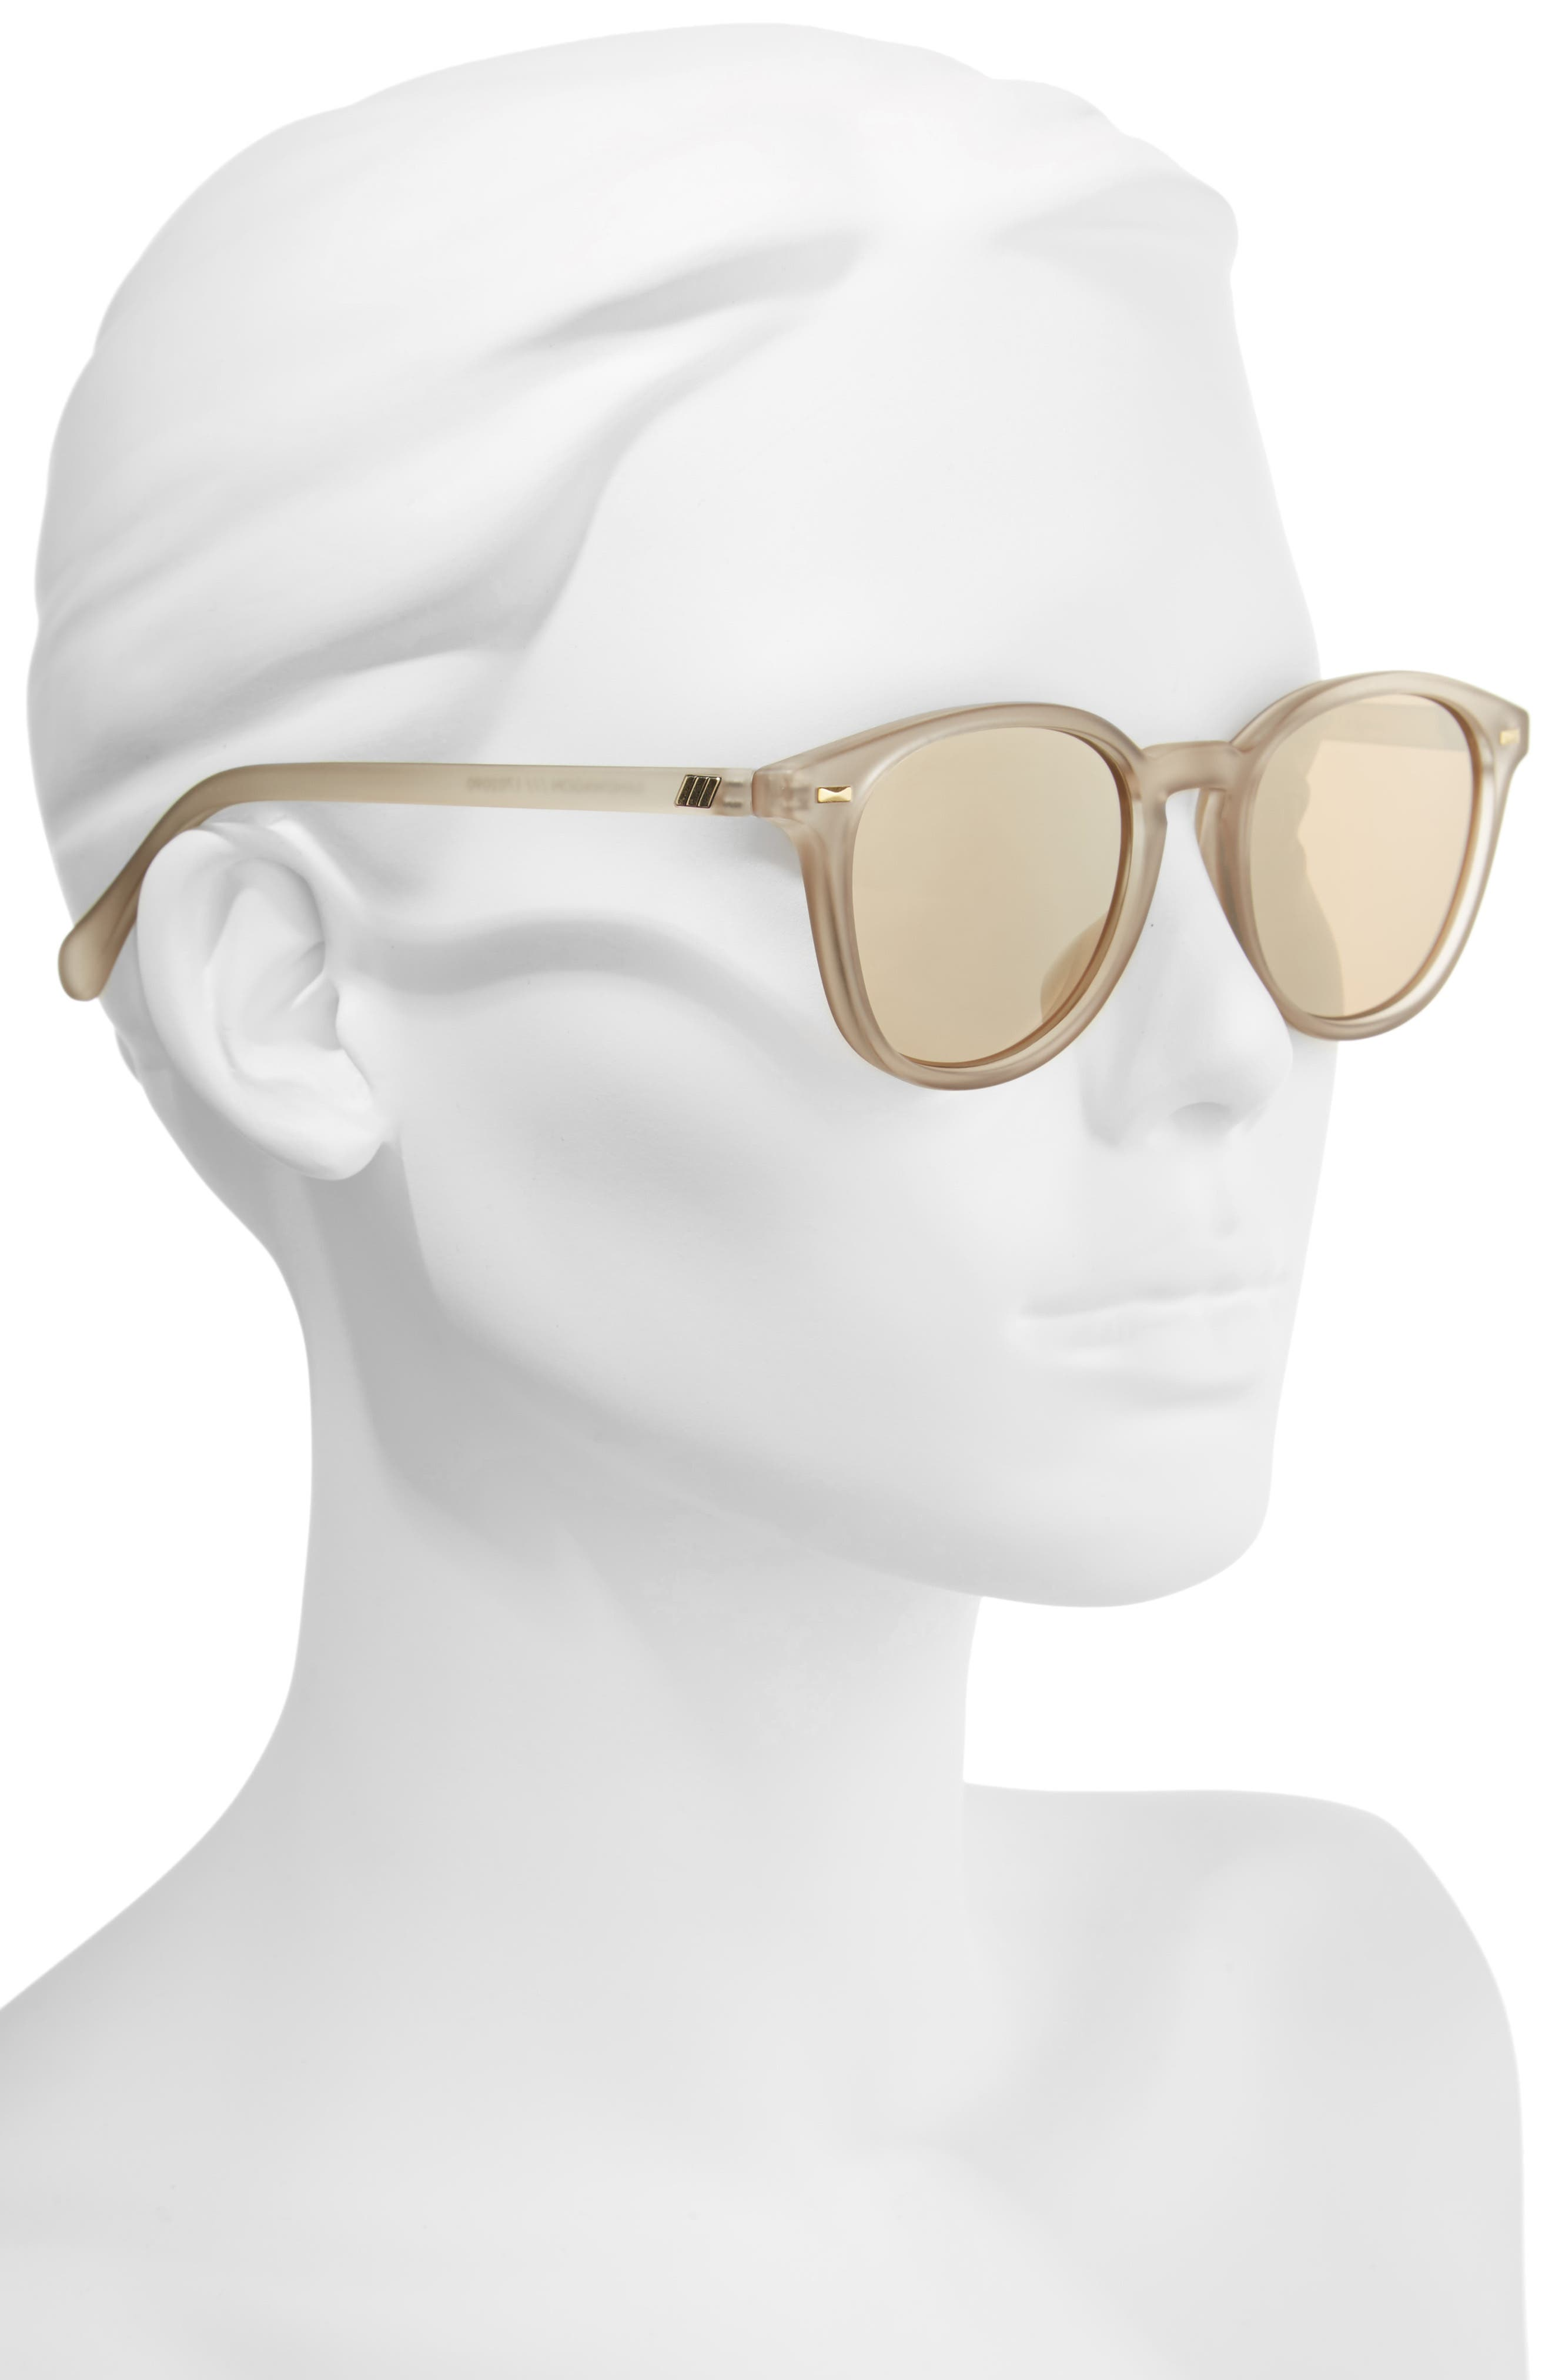 LE SPECS, Bandwagon 51mm Sunglasses, Alternate thumbnail 2, color, MATTE STONE